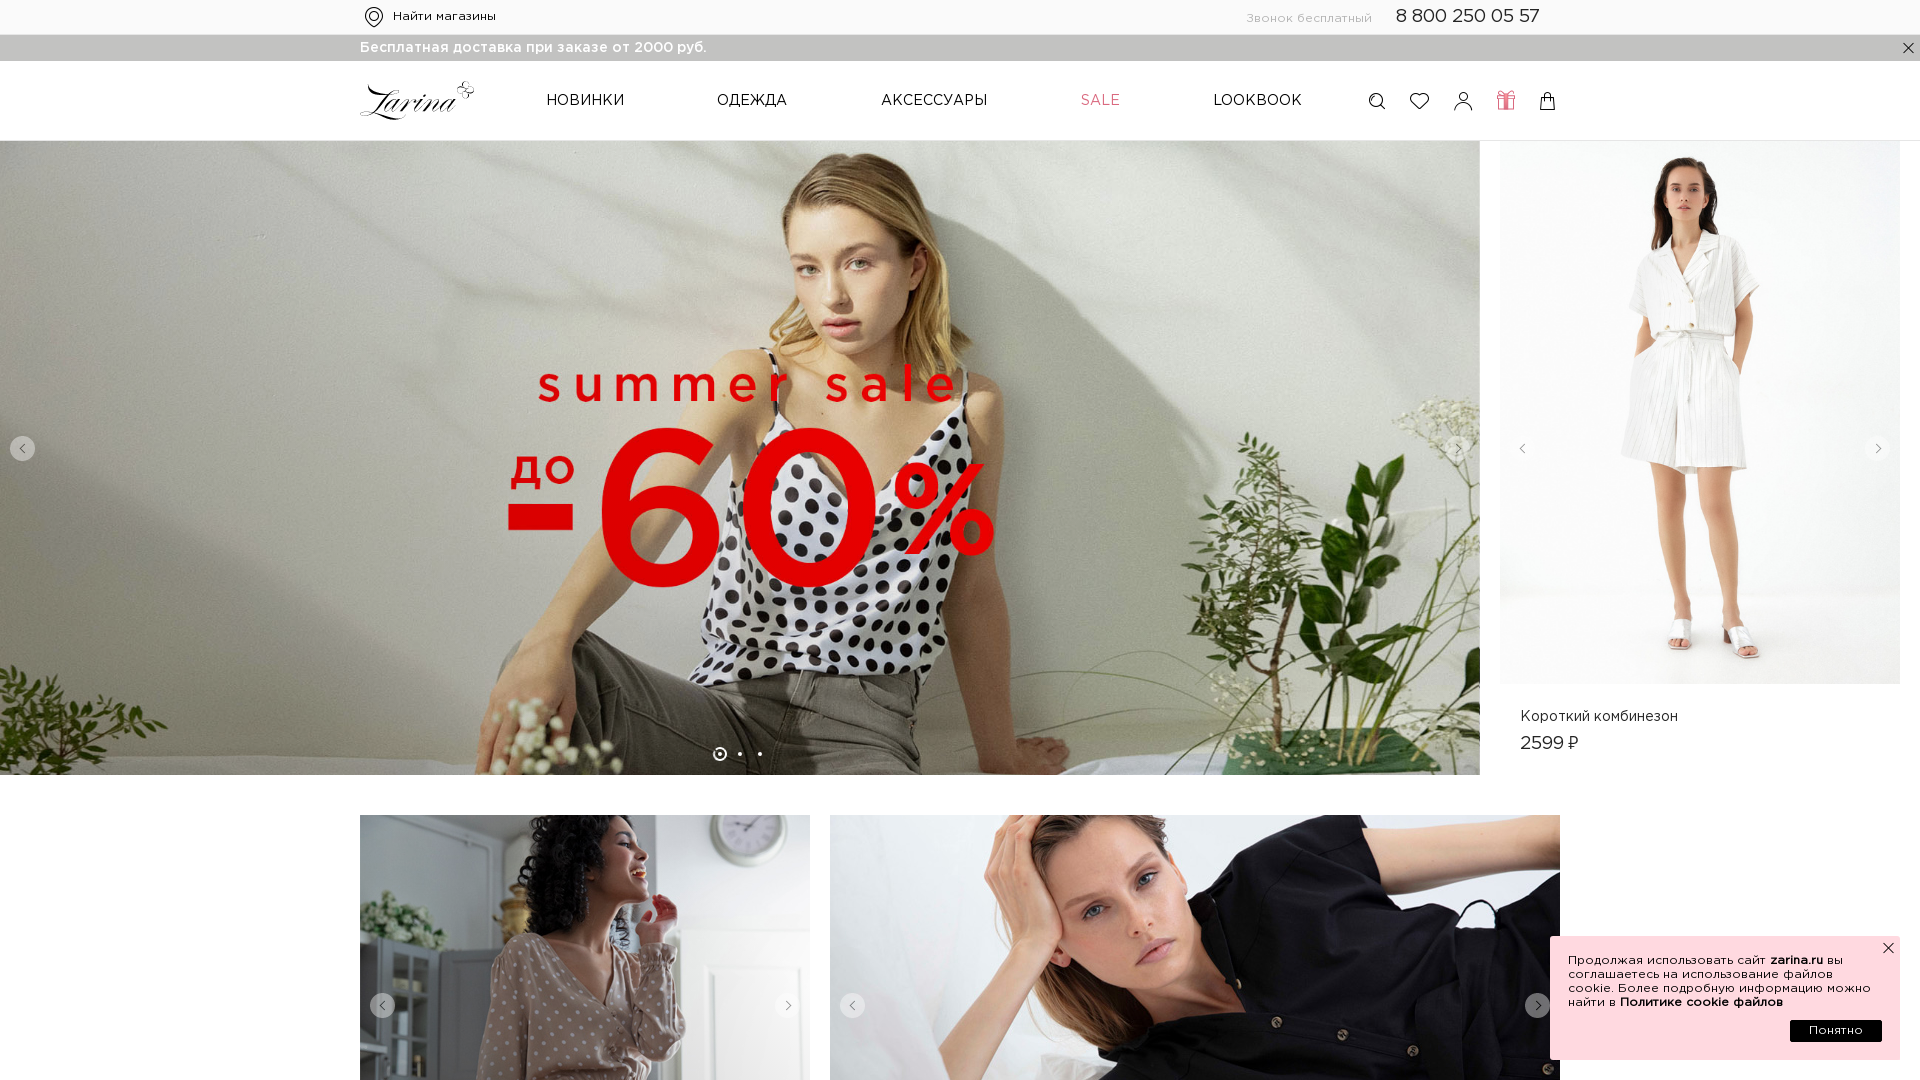 Zarina website